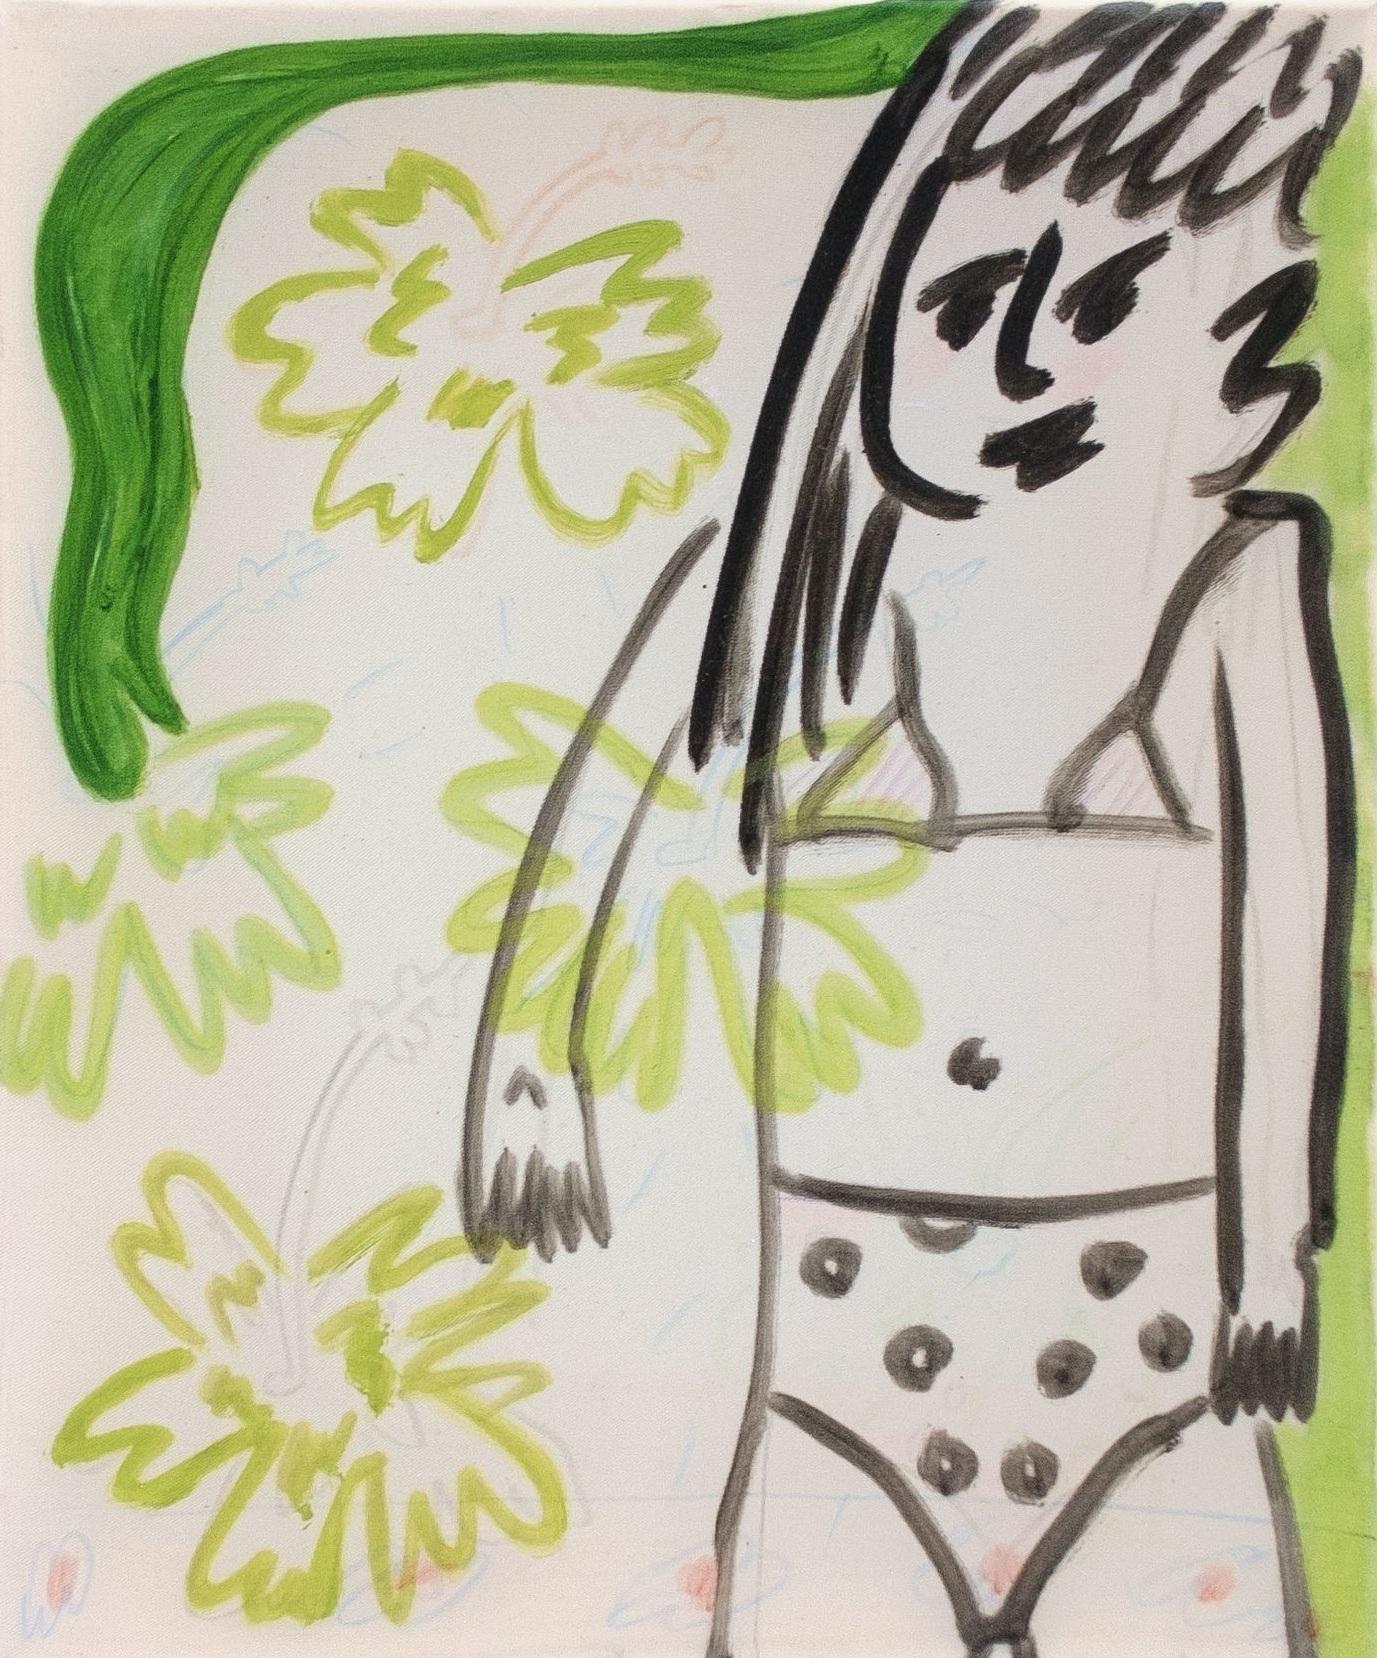 Green Girl  28 x 20 cm  Oil on Transparent Fabric